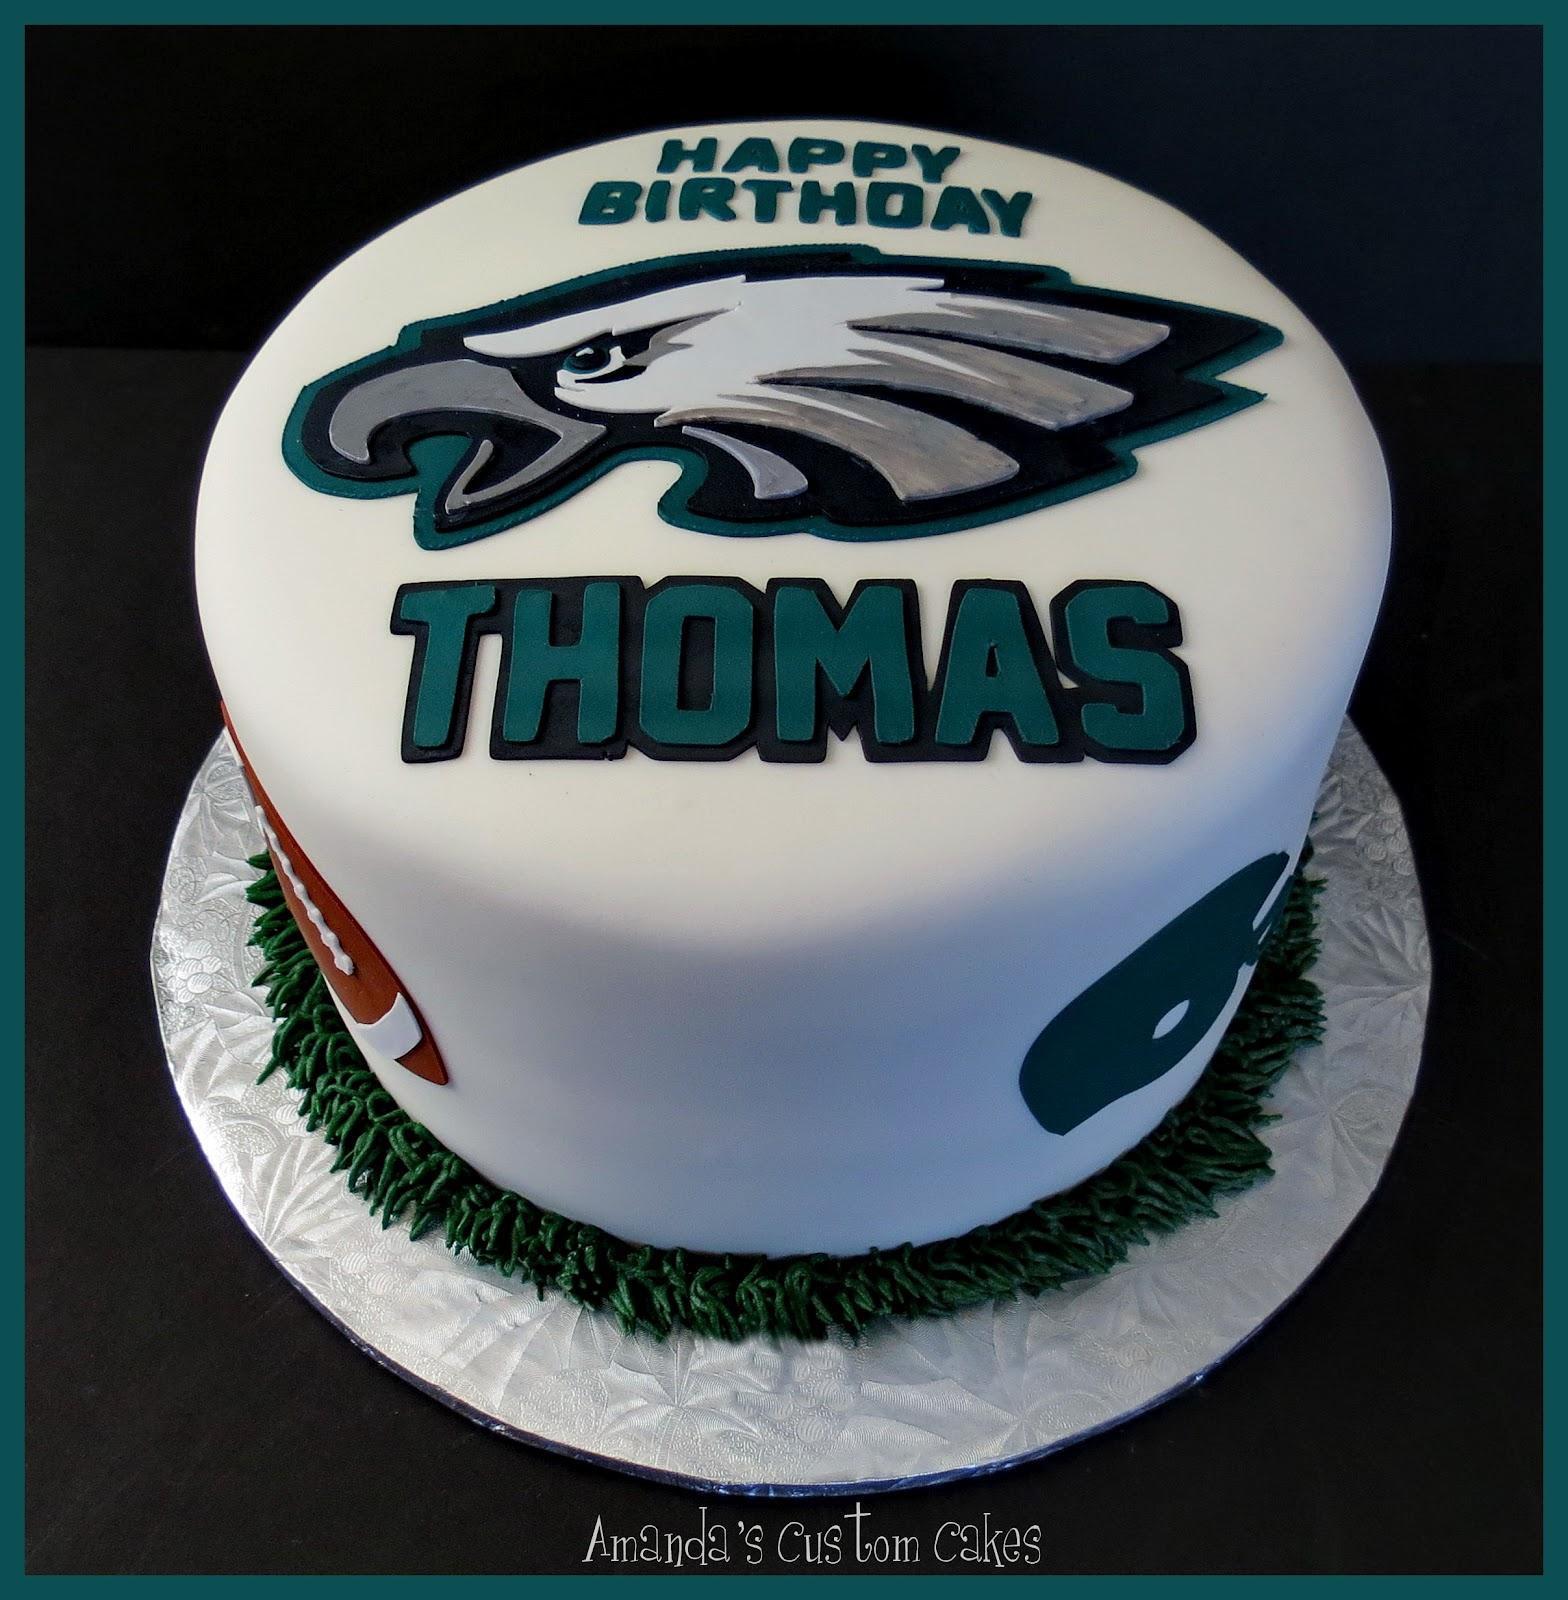 Birthday Cakes In Philadelphia - Kinds Of Cakes Onteevo.Com